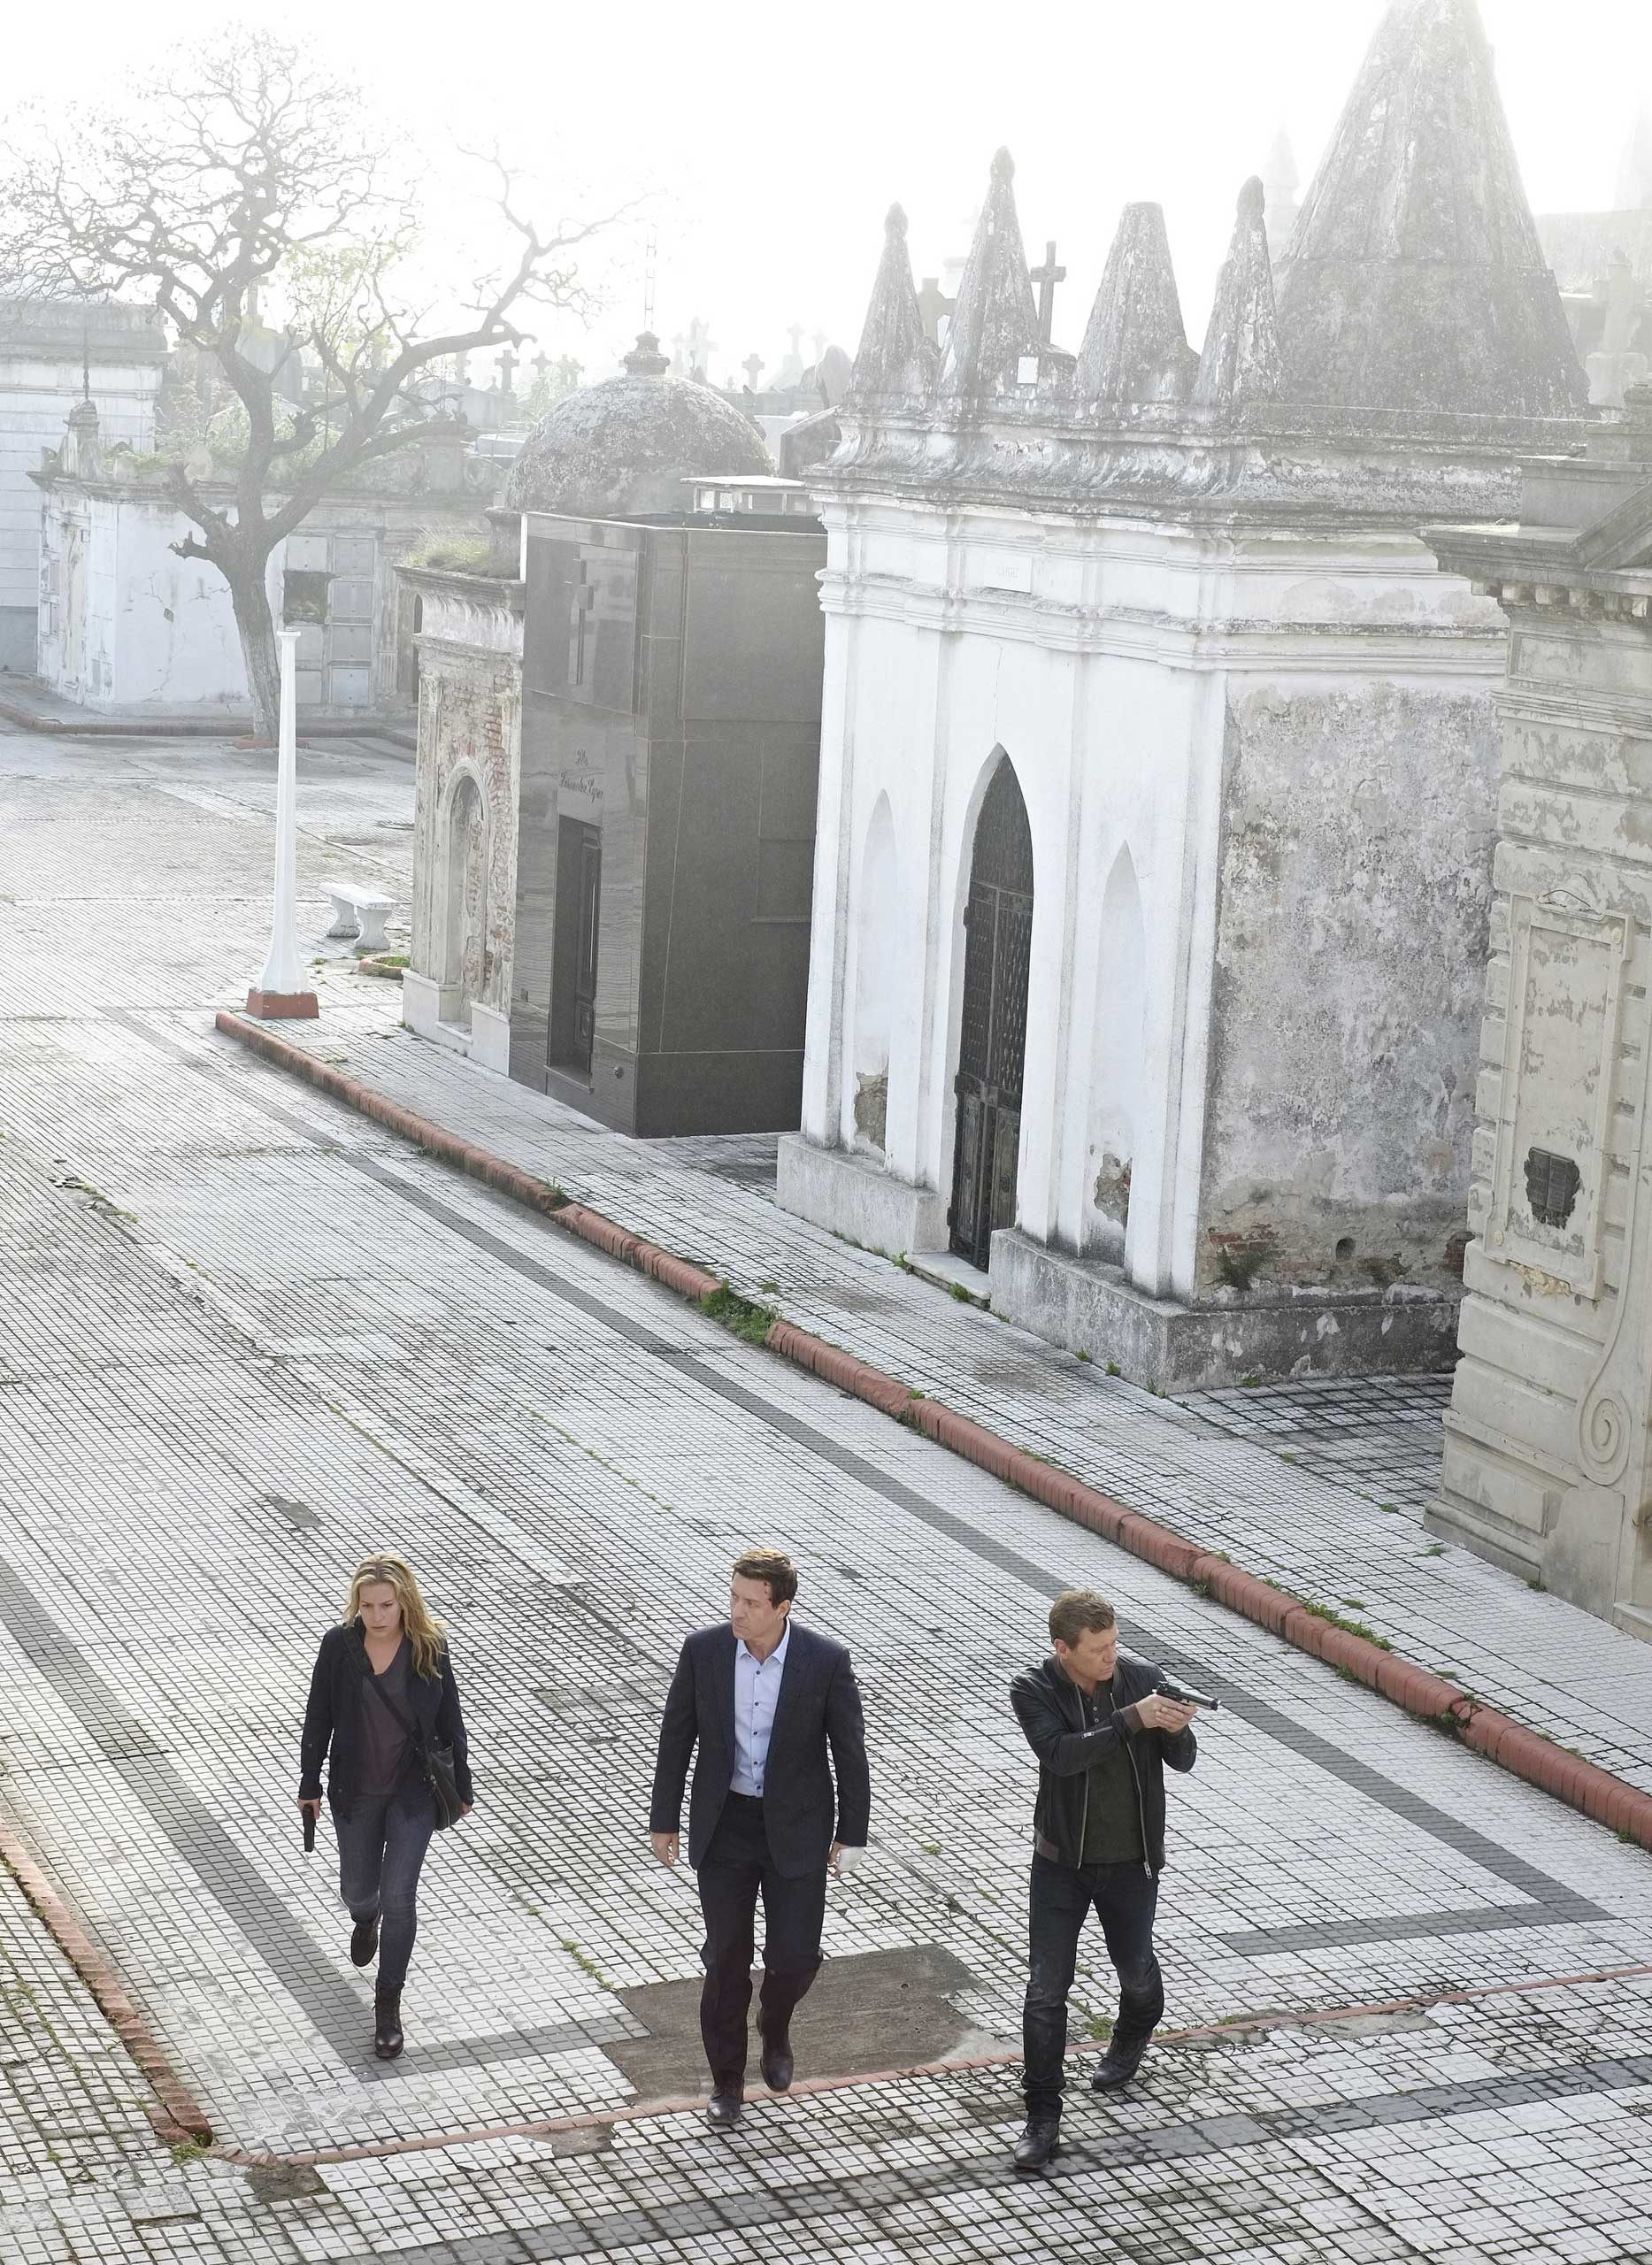 (left-right) Piper Perabo as Annie Walker, Shawn Doyle as Belenko, Nic Bishop as Ryan McQuaid in Covert Affaris Episode 516